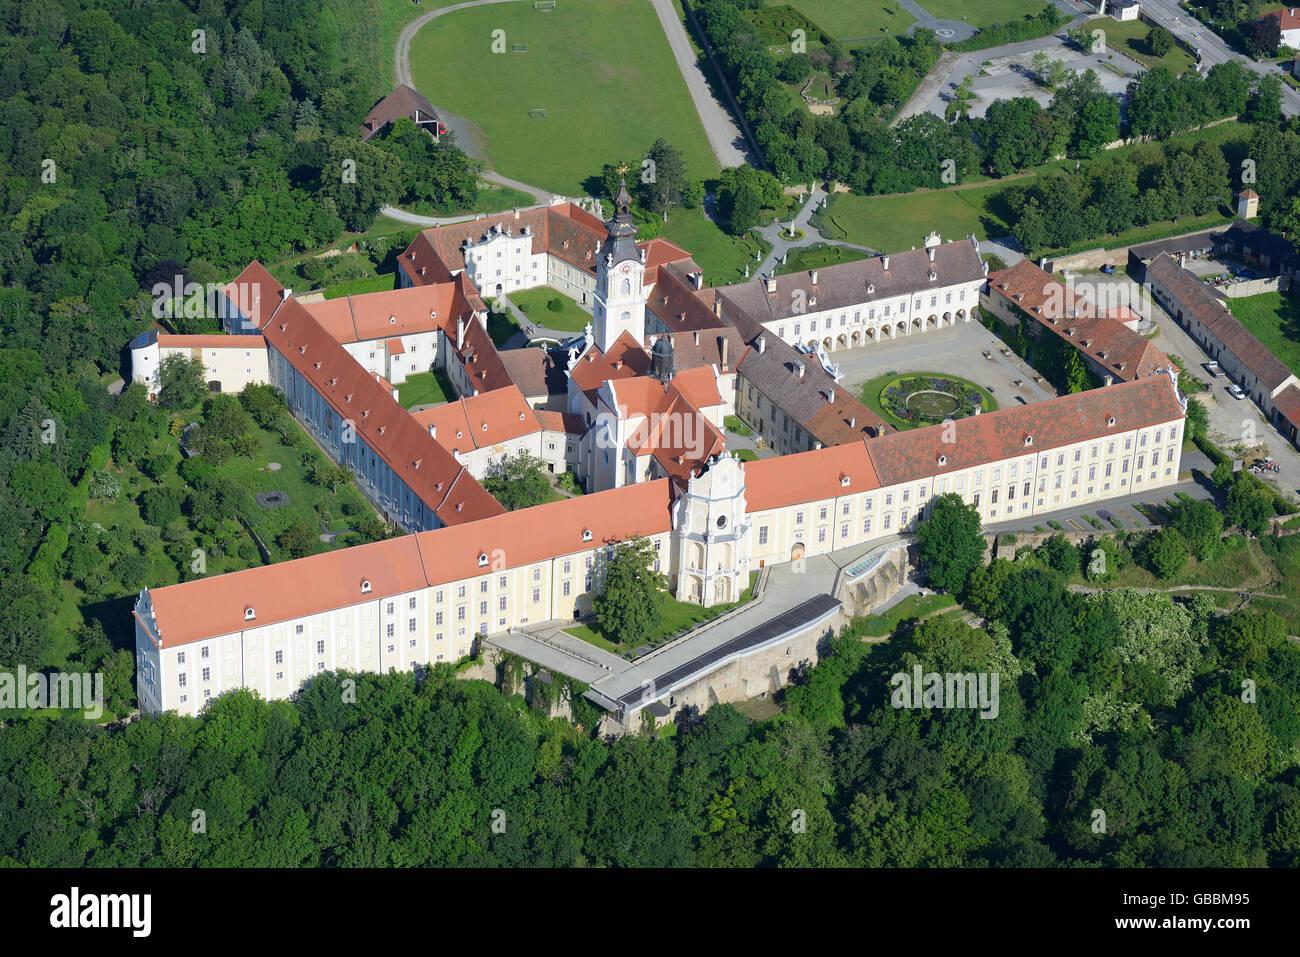 ALTENBURG ABBEY (aerial view). Lower Austria, Austria. - Stock Image